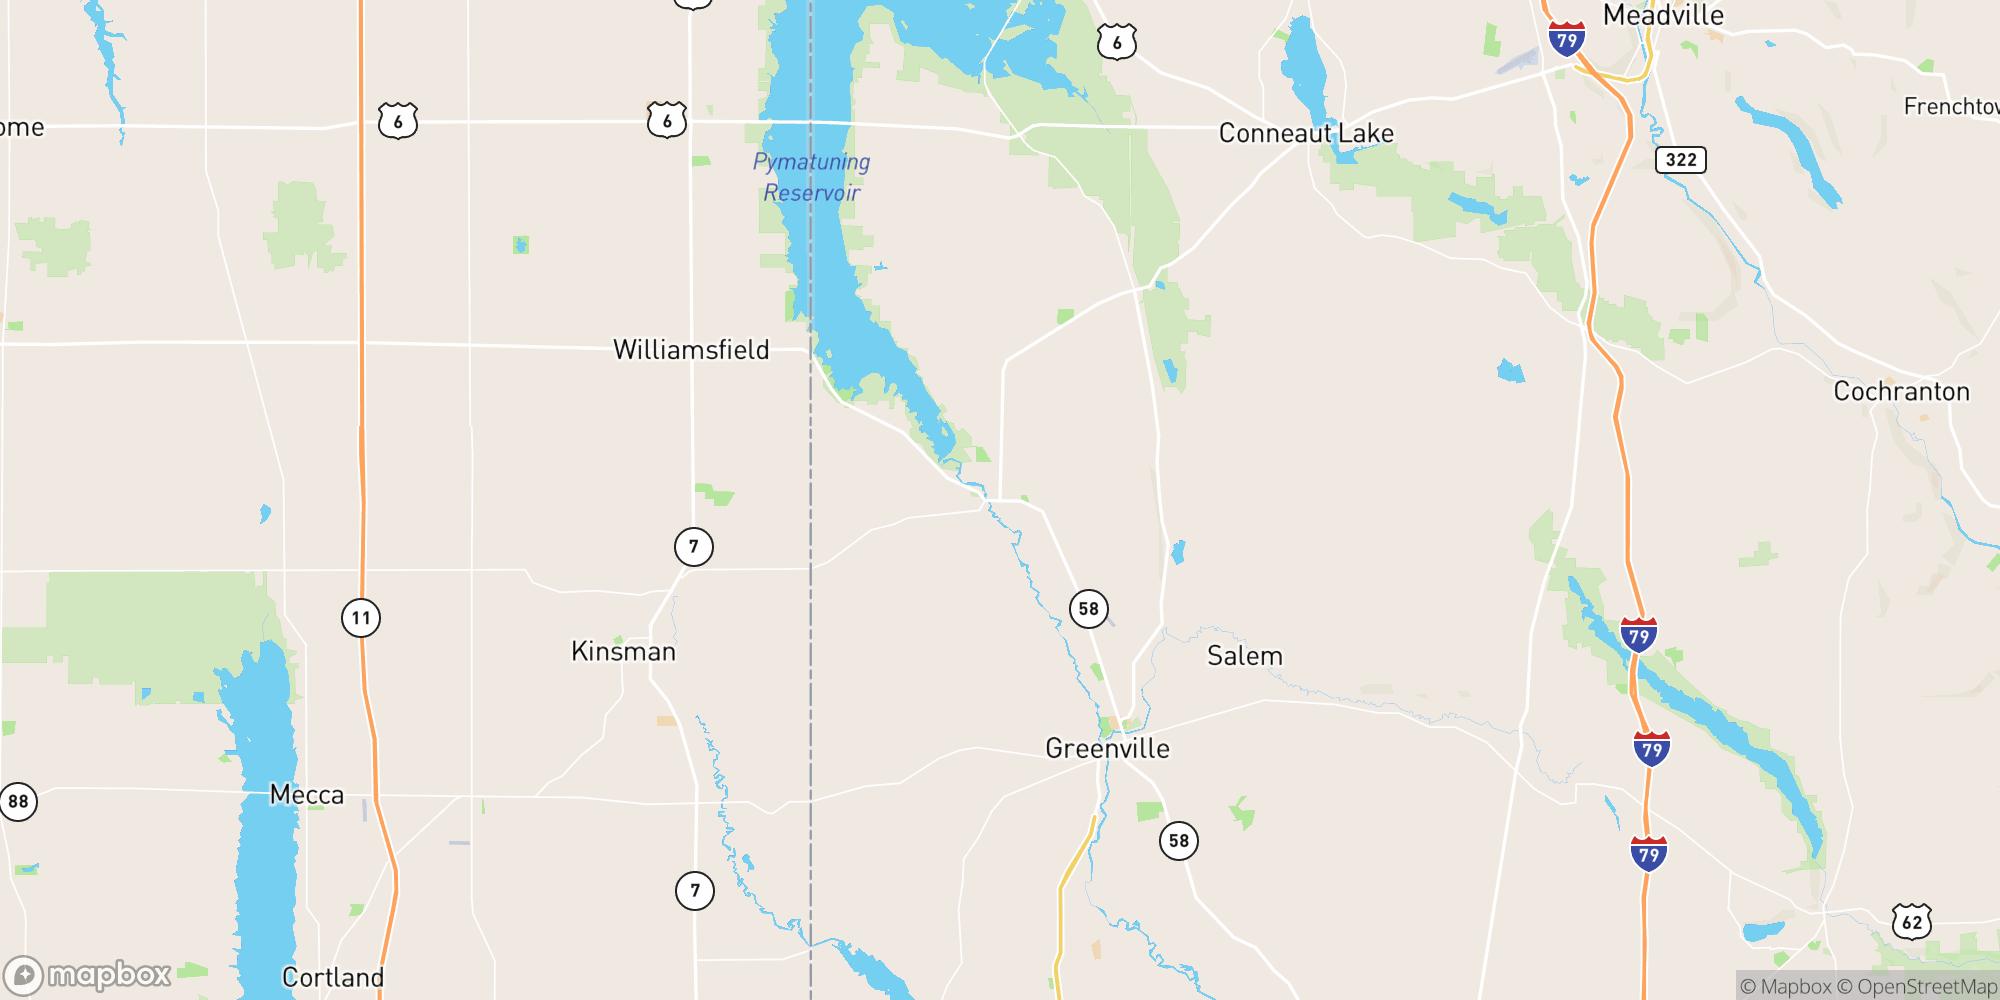 Map of Well-Established Family Restaurant in Mercer County